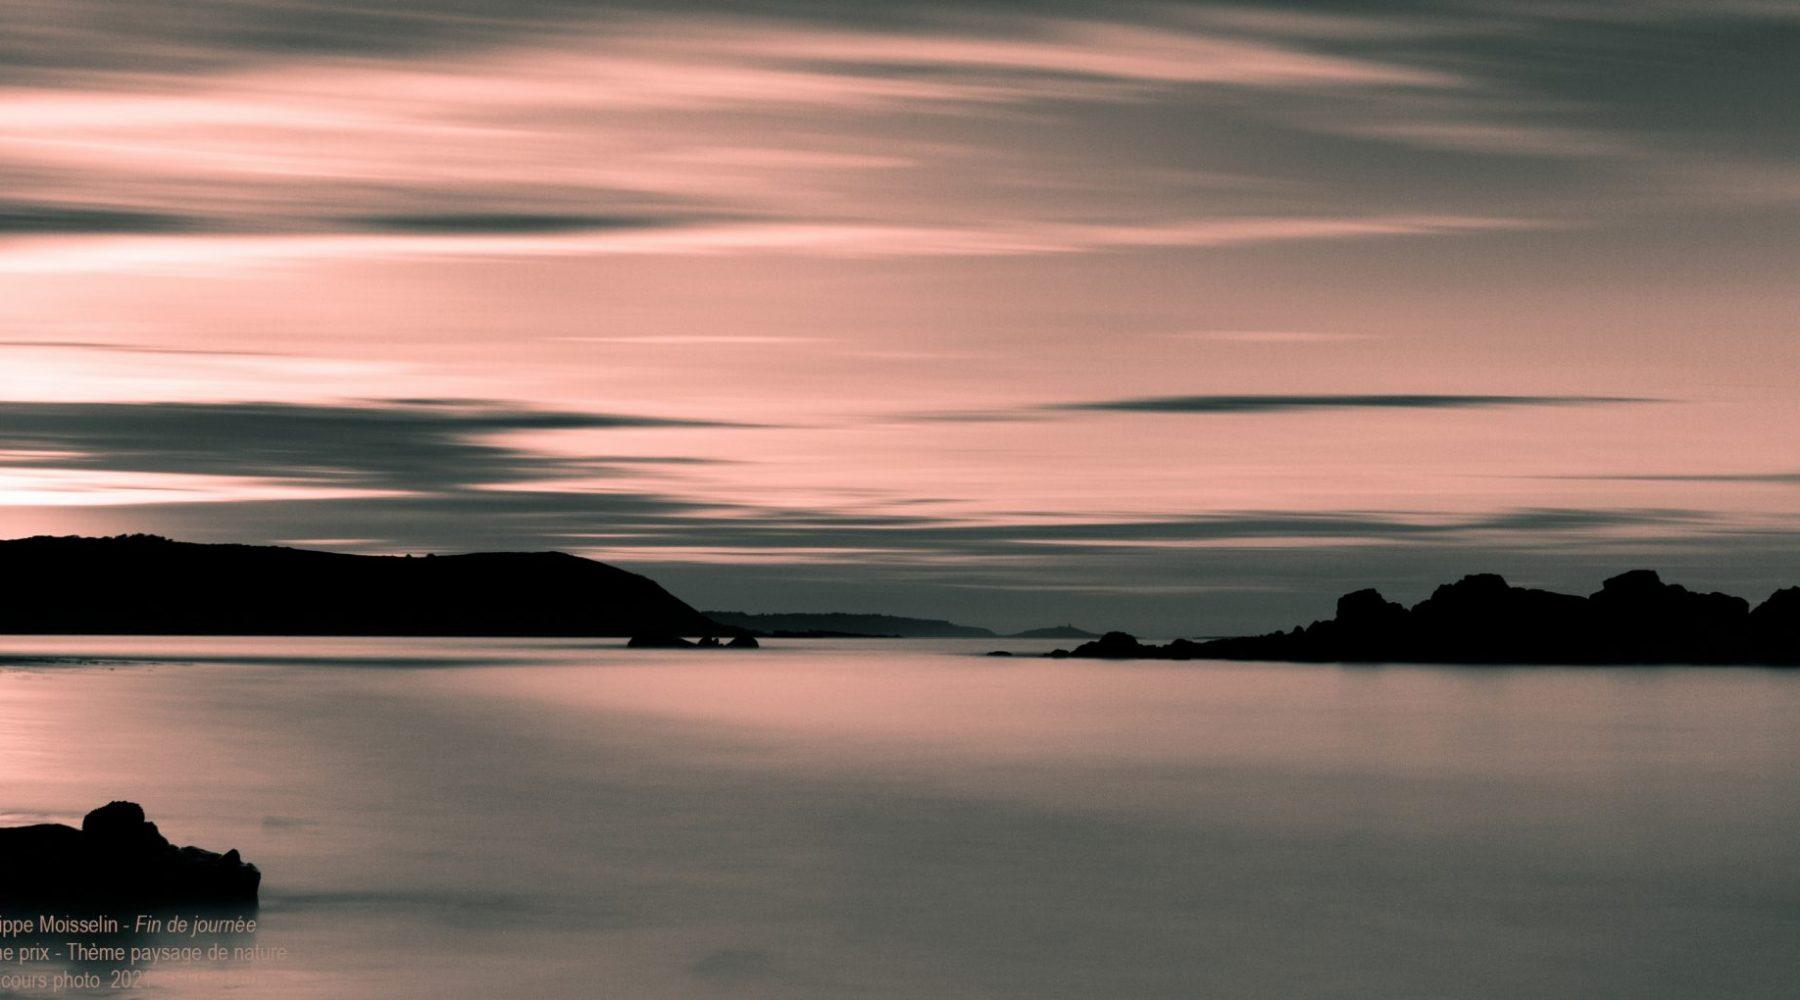 Fin de journée – ©Philippe Moisselin